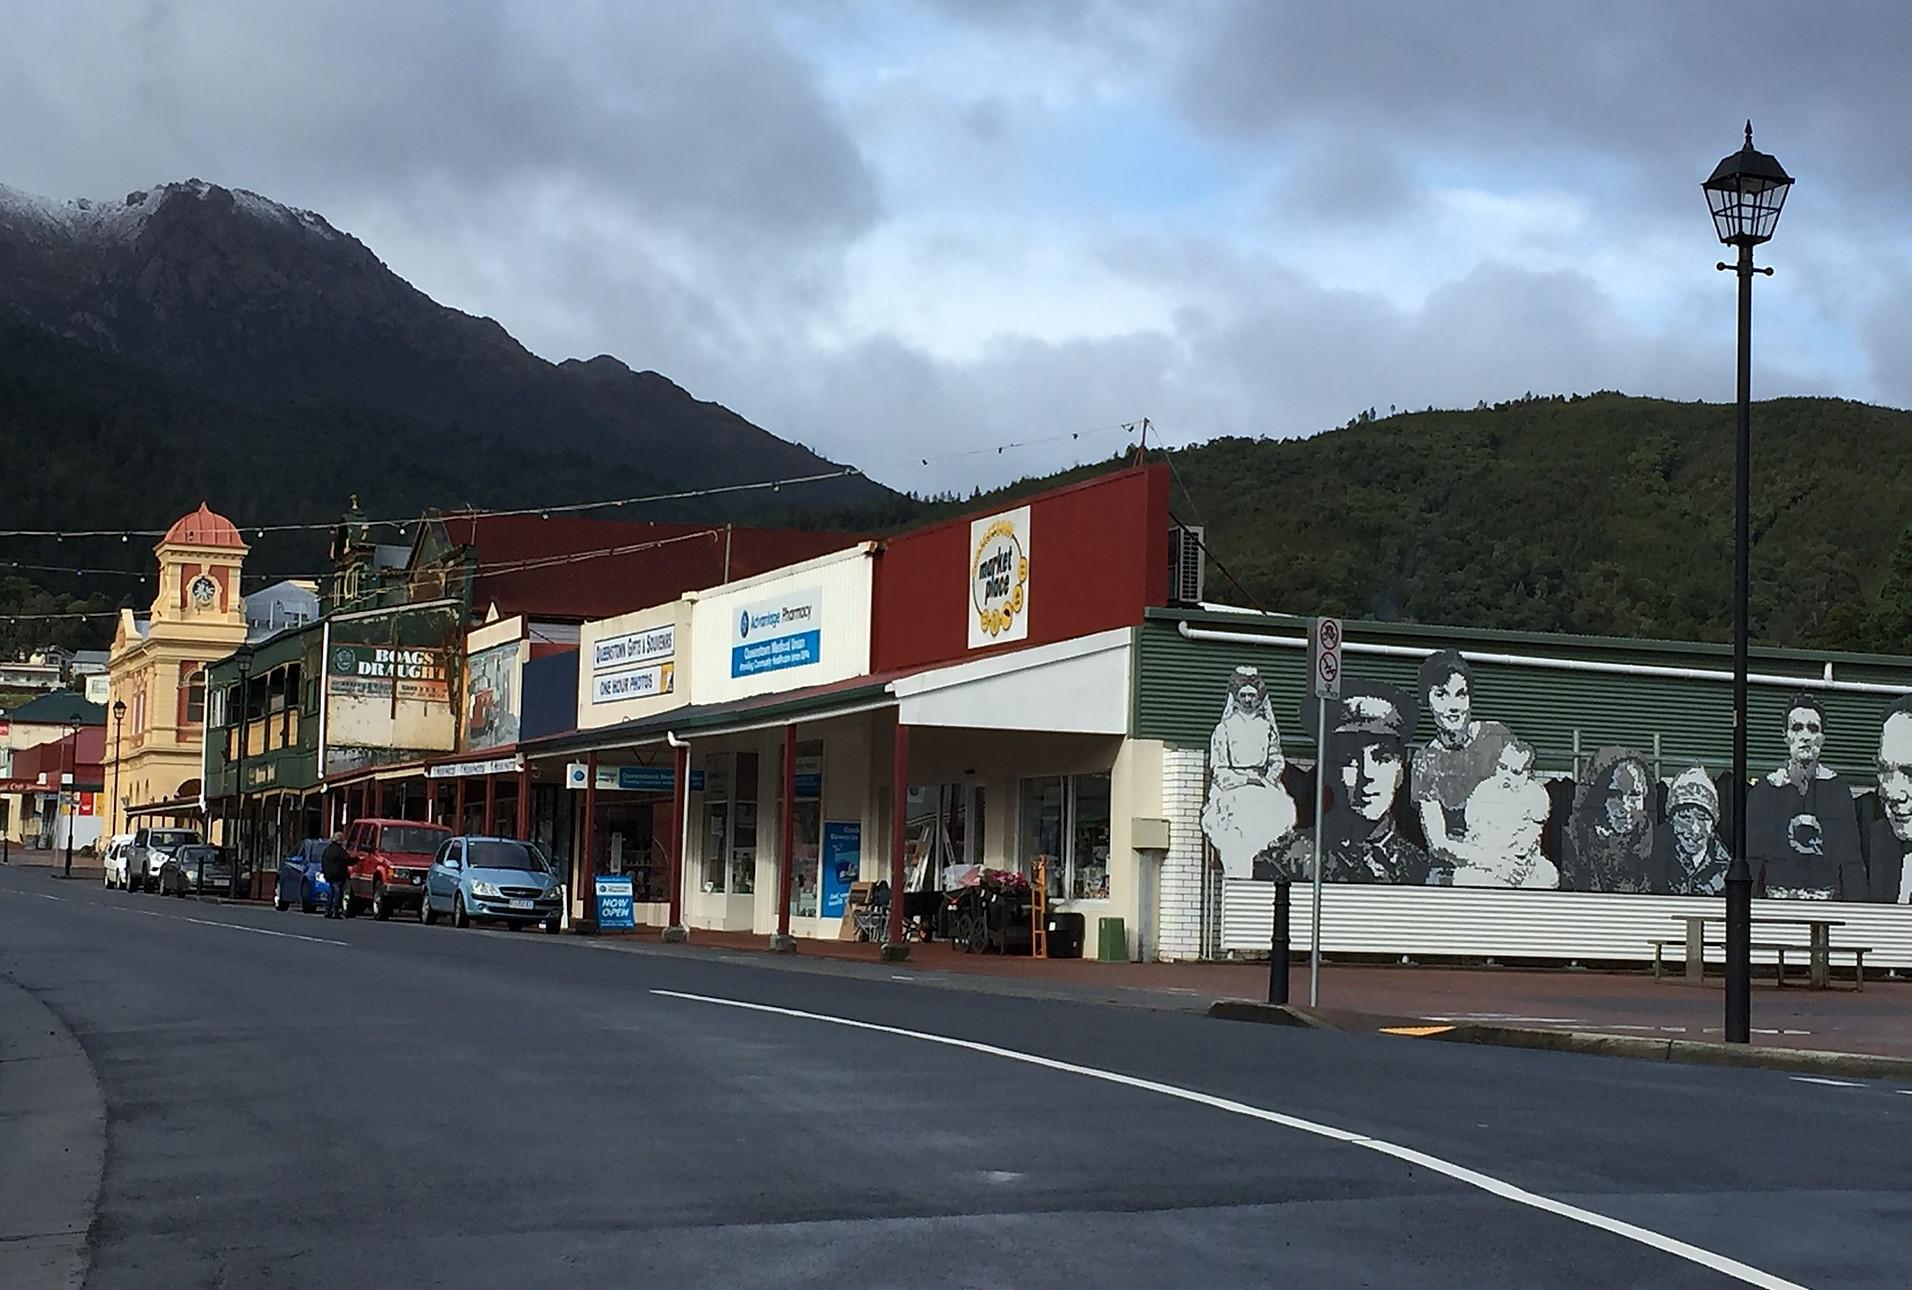 Queenstown — Тасмания 2017 — Блог о путешествиях Сергея Чеботова